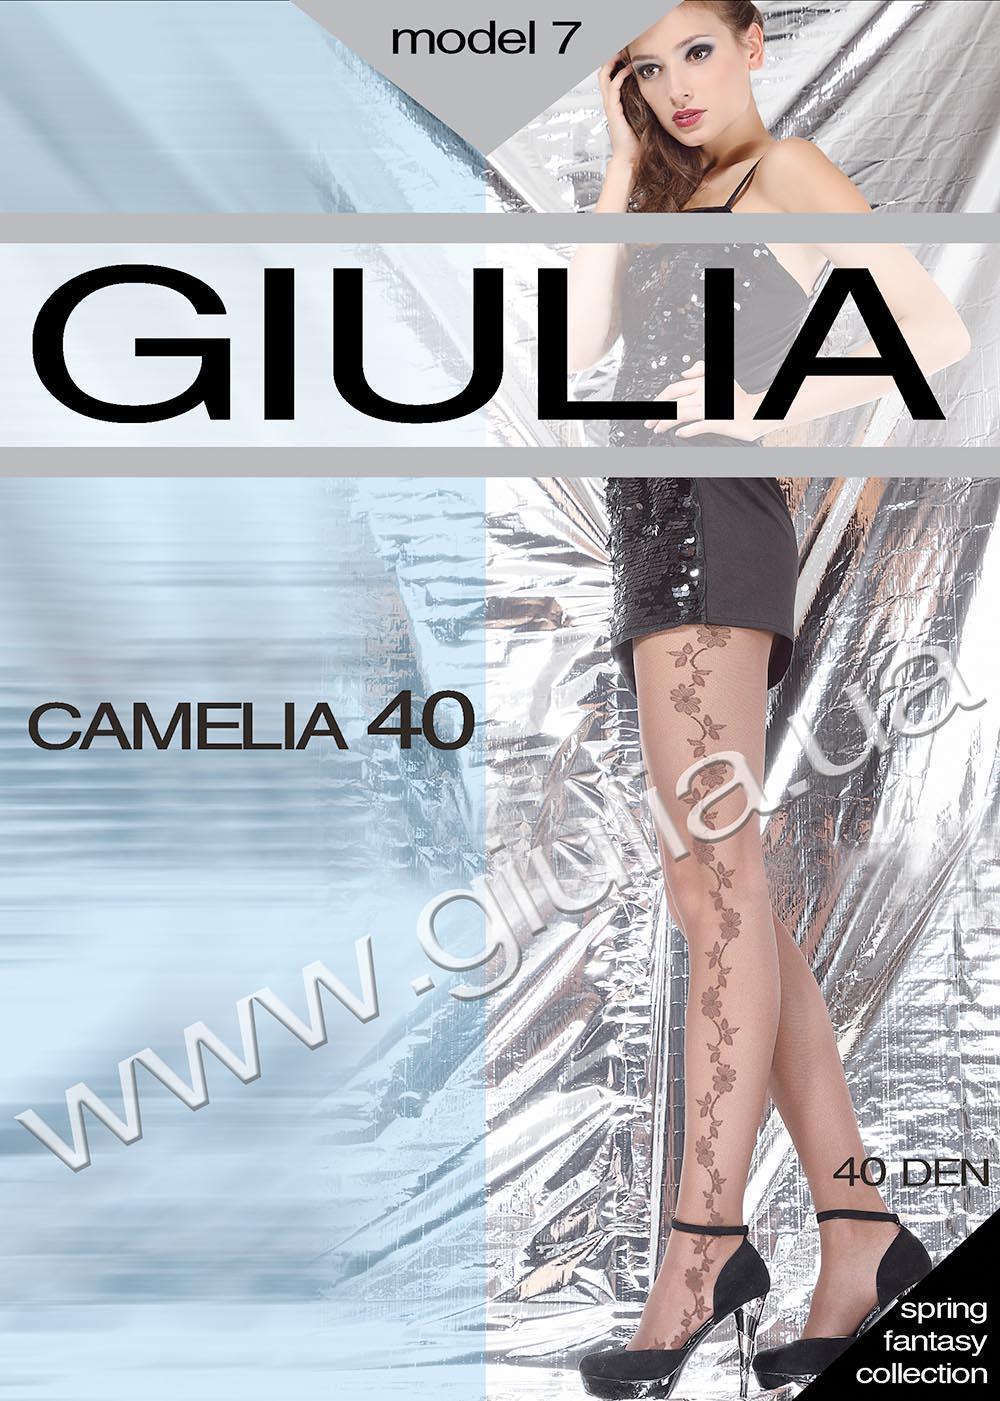 Колготки с рисунком CAMELIA 40 model 7